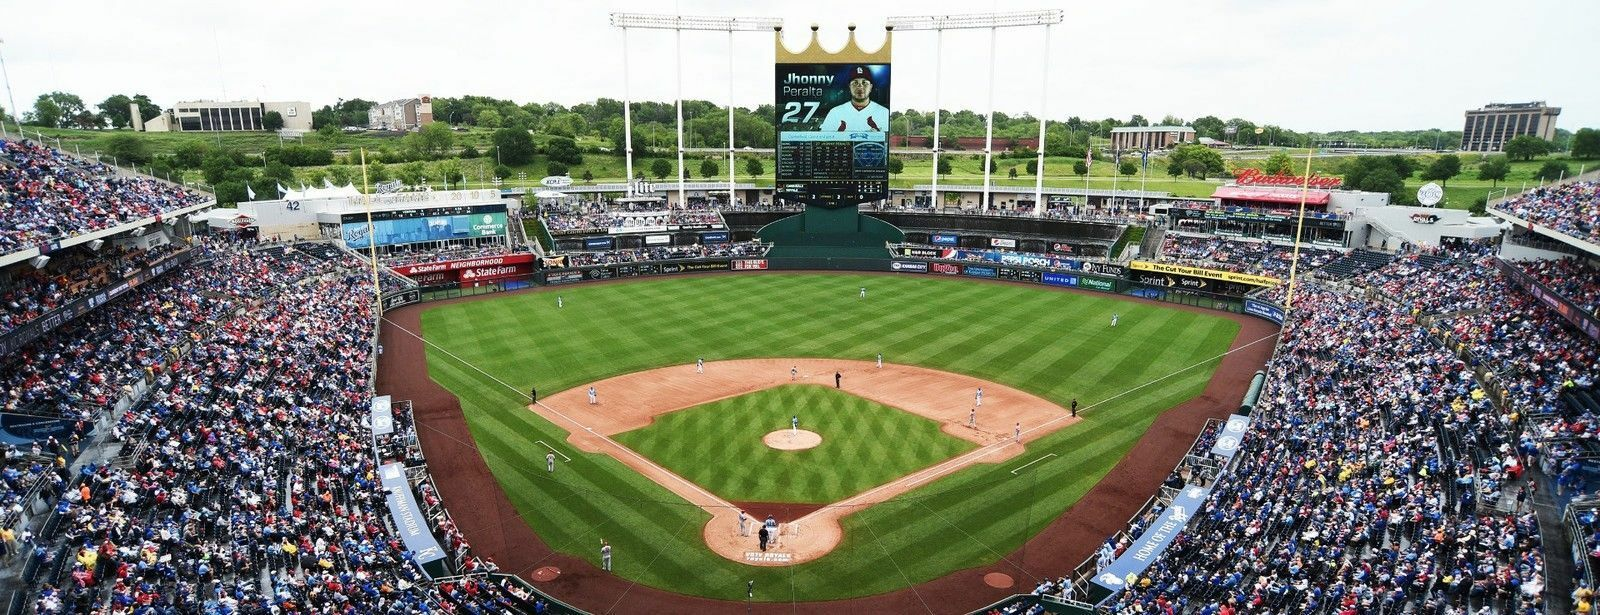 Kansas City Royals Parking Passes for Events - Stubhub